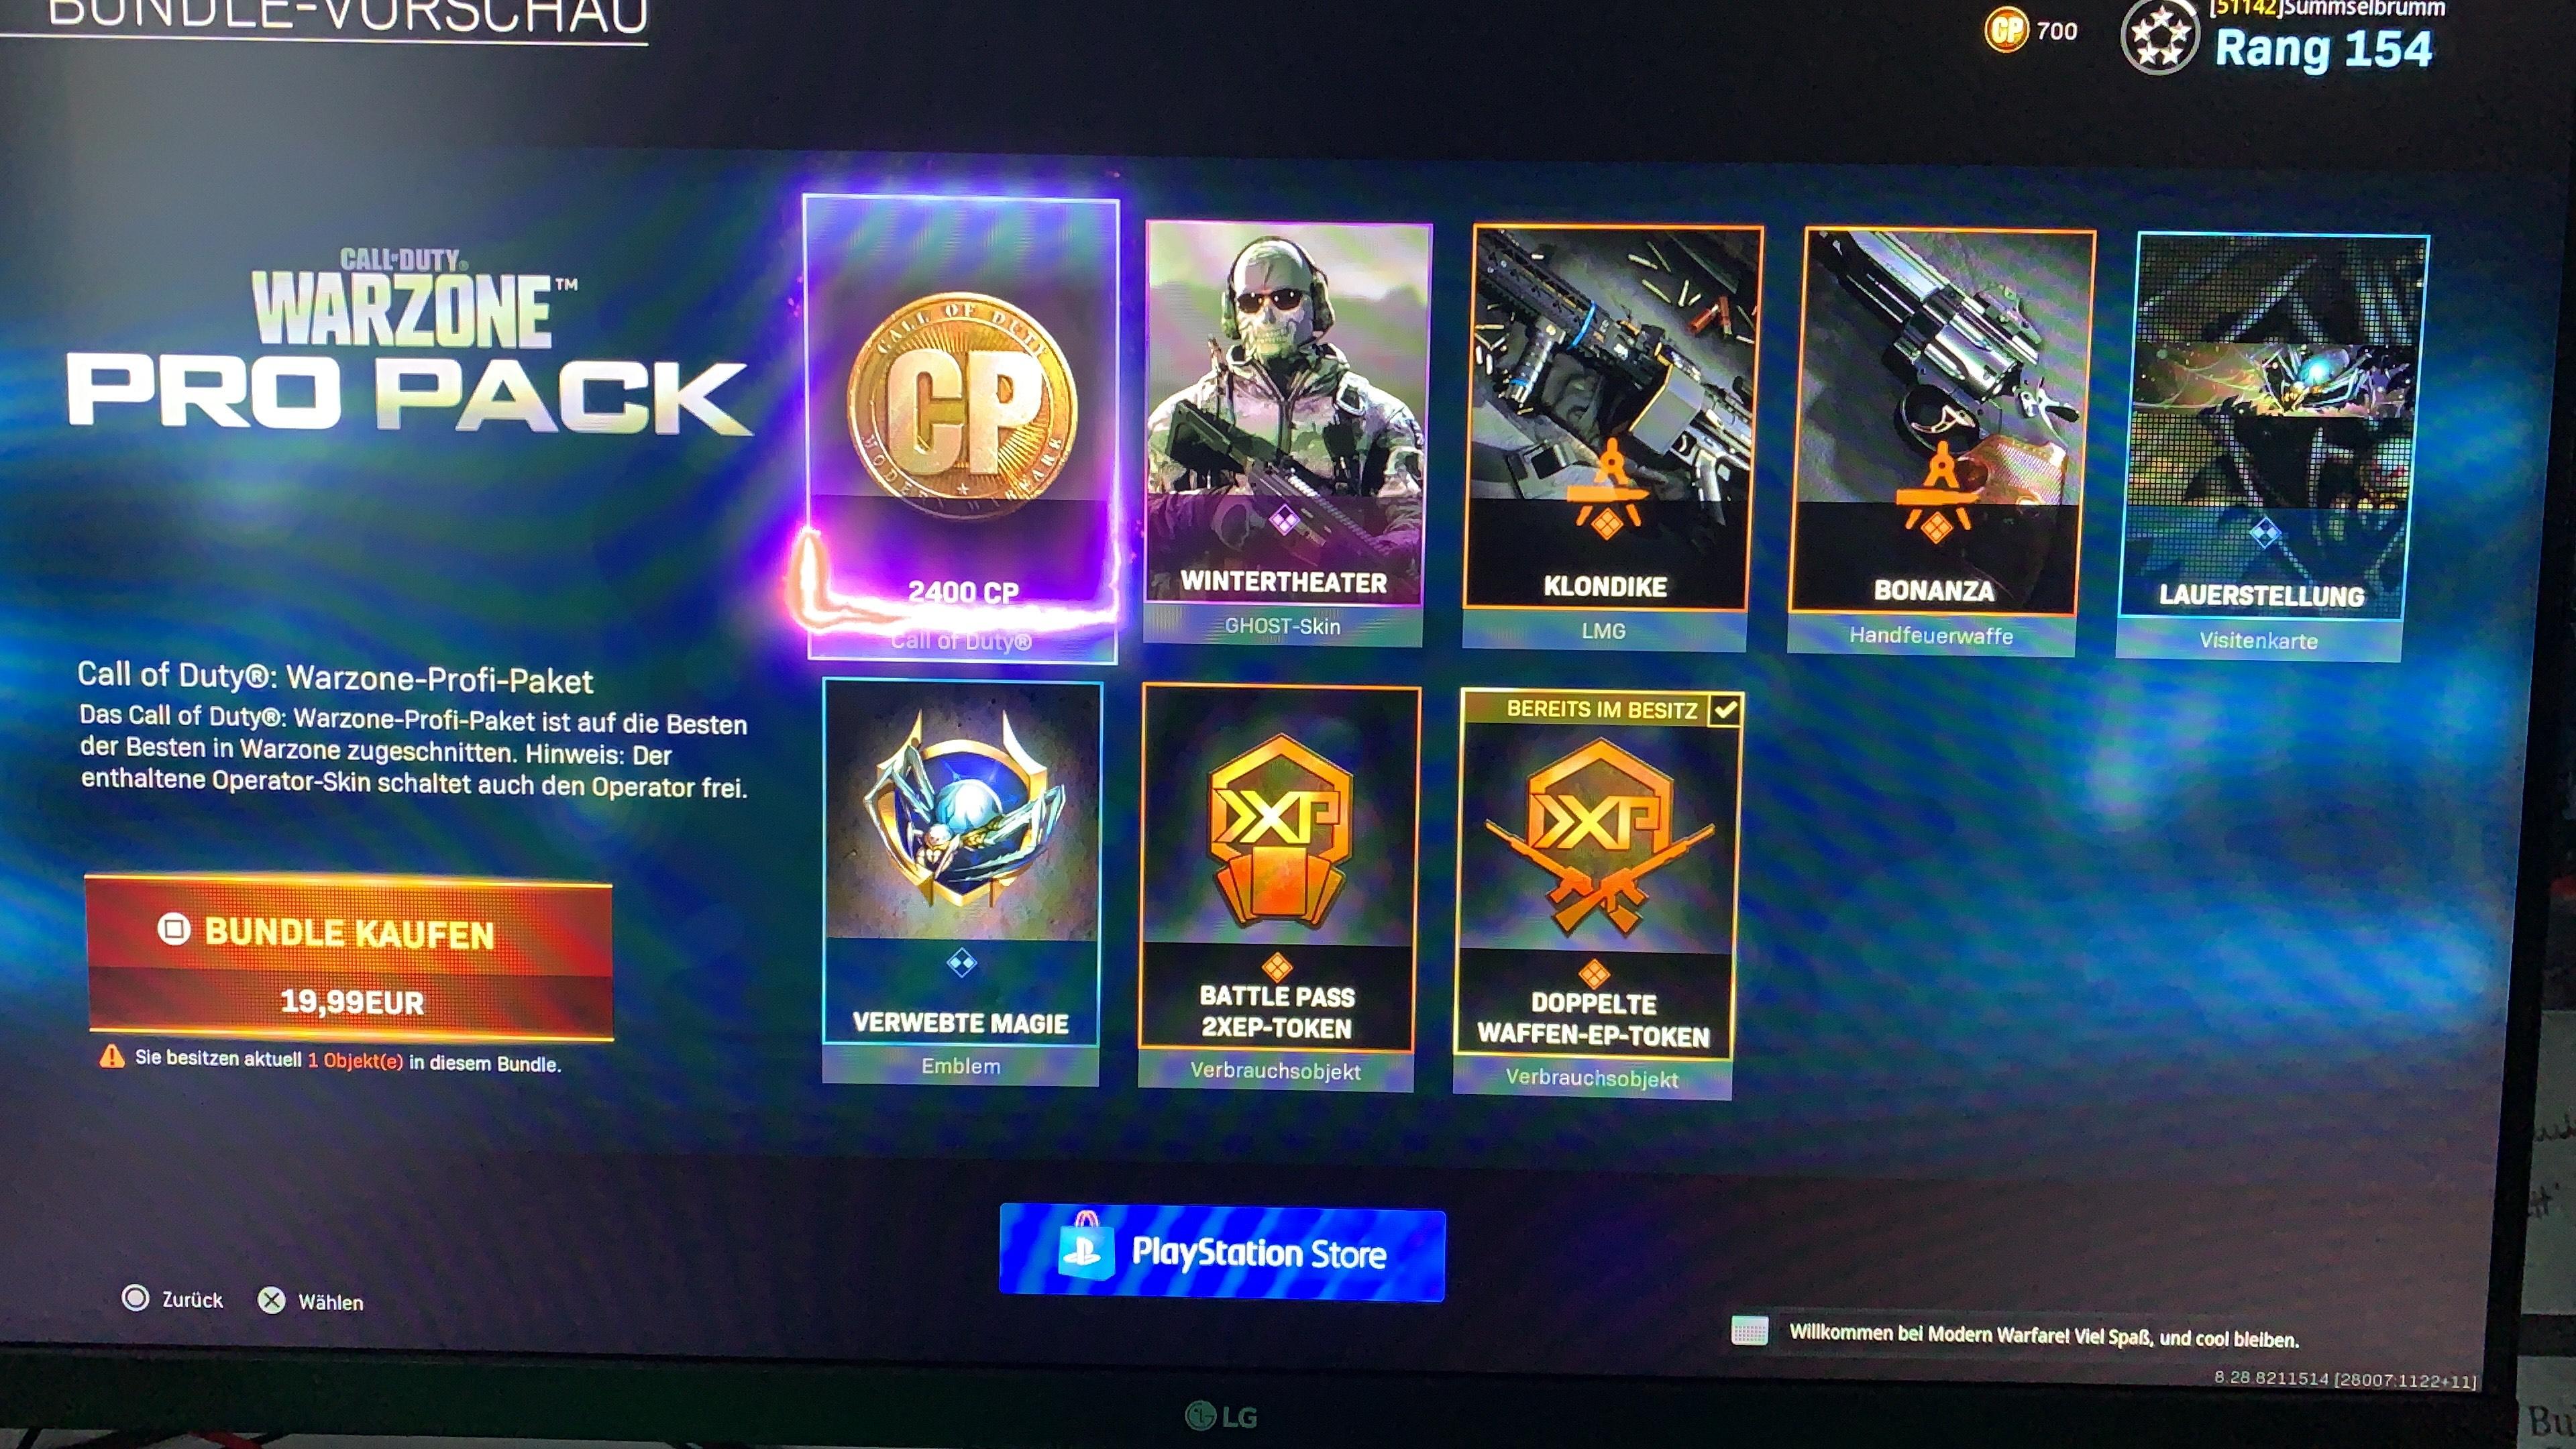 Call Of Duty Punkte plus gratis Operator, Waffenbauplänen und EP Boost